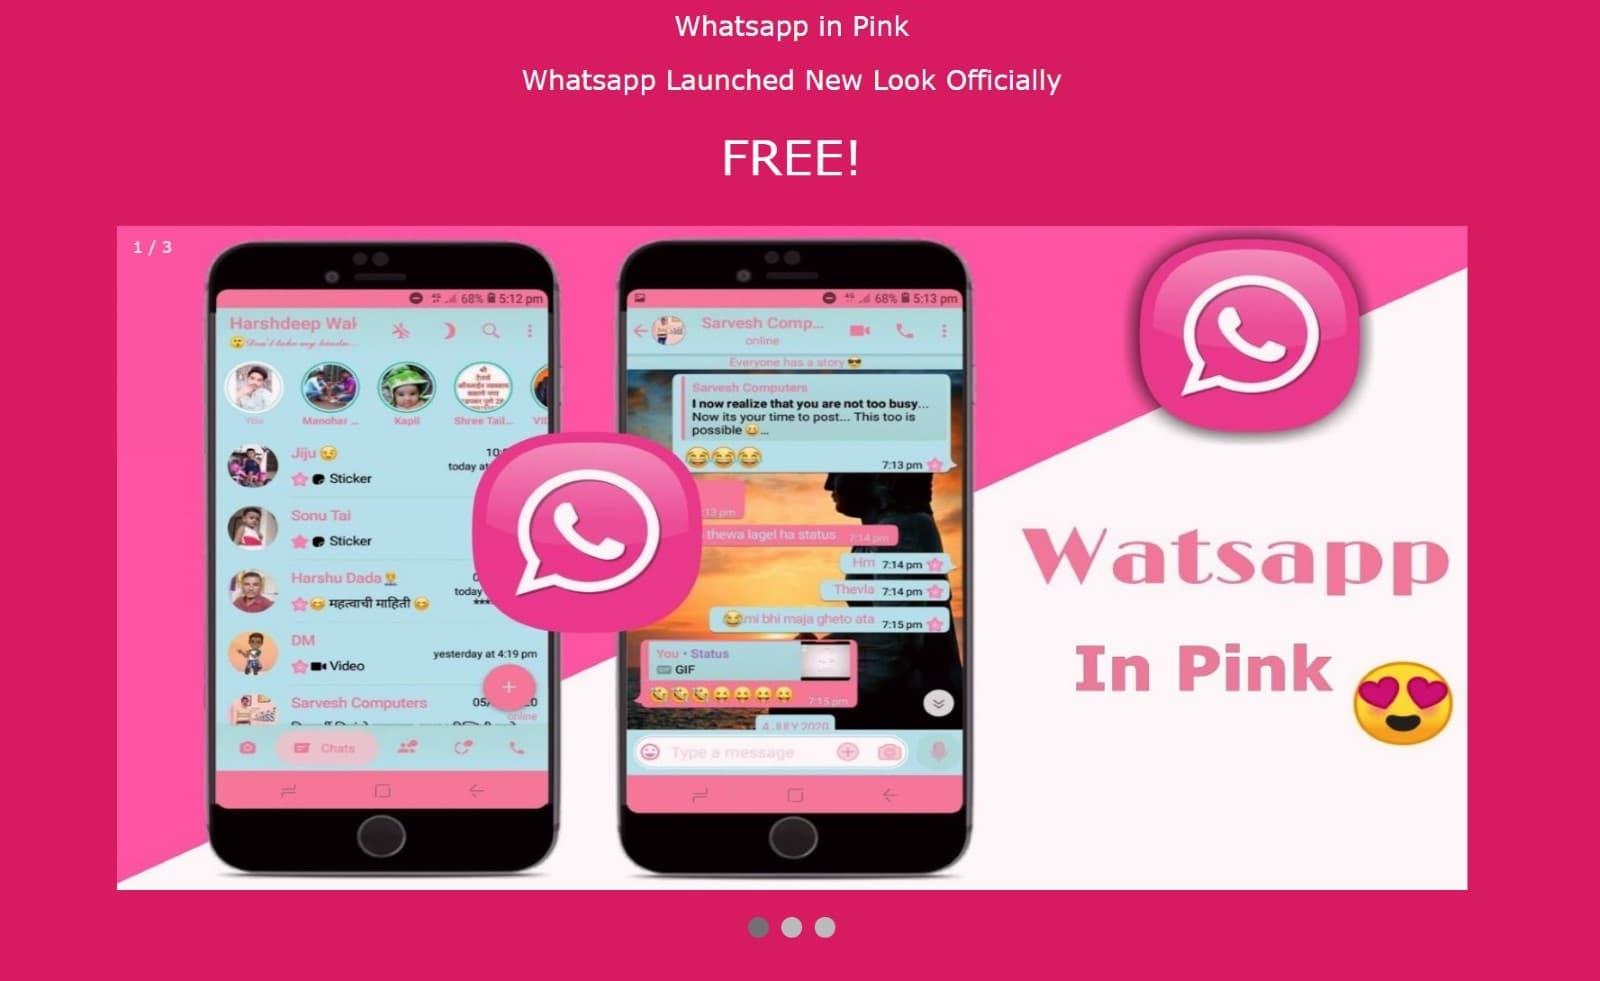 WhatsApp in pink